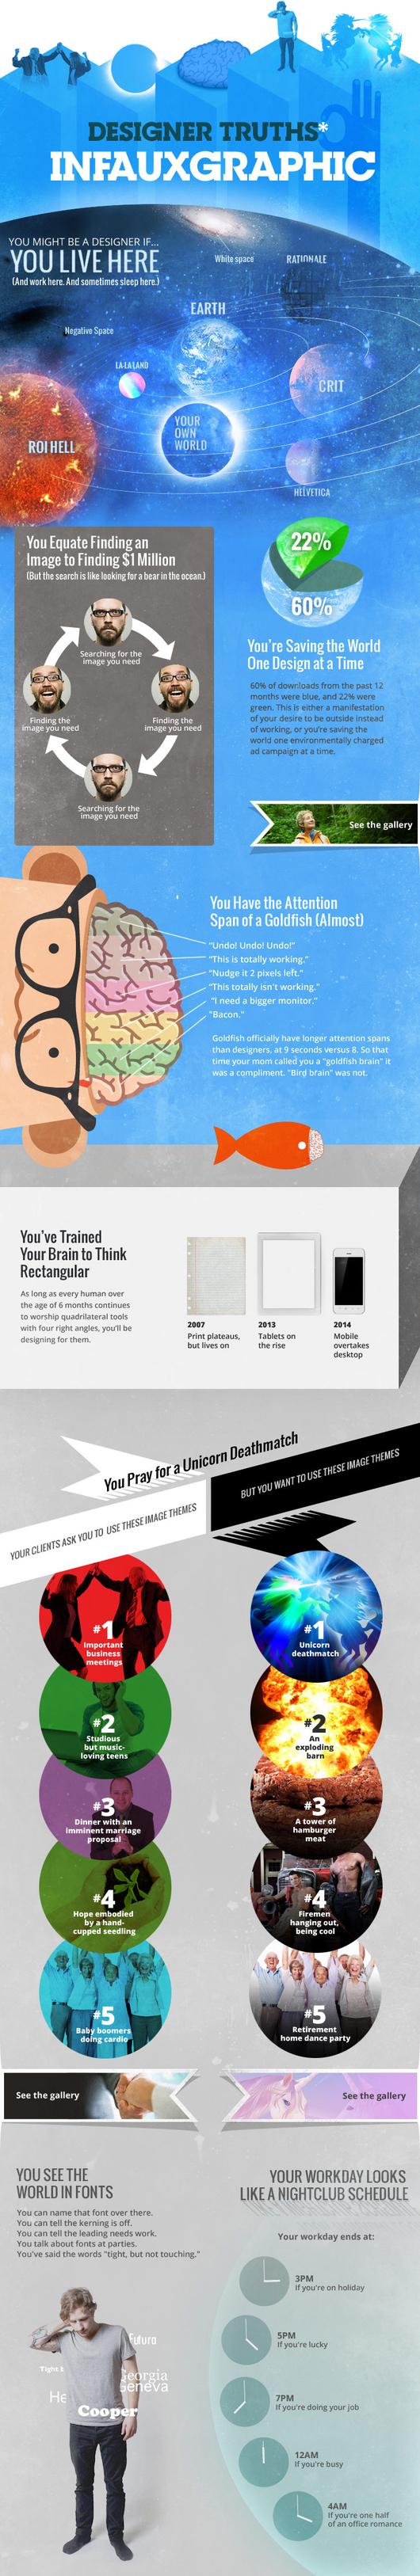 istock_designer_infographic.jpg